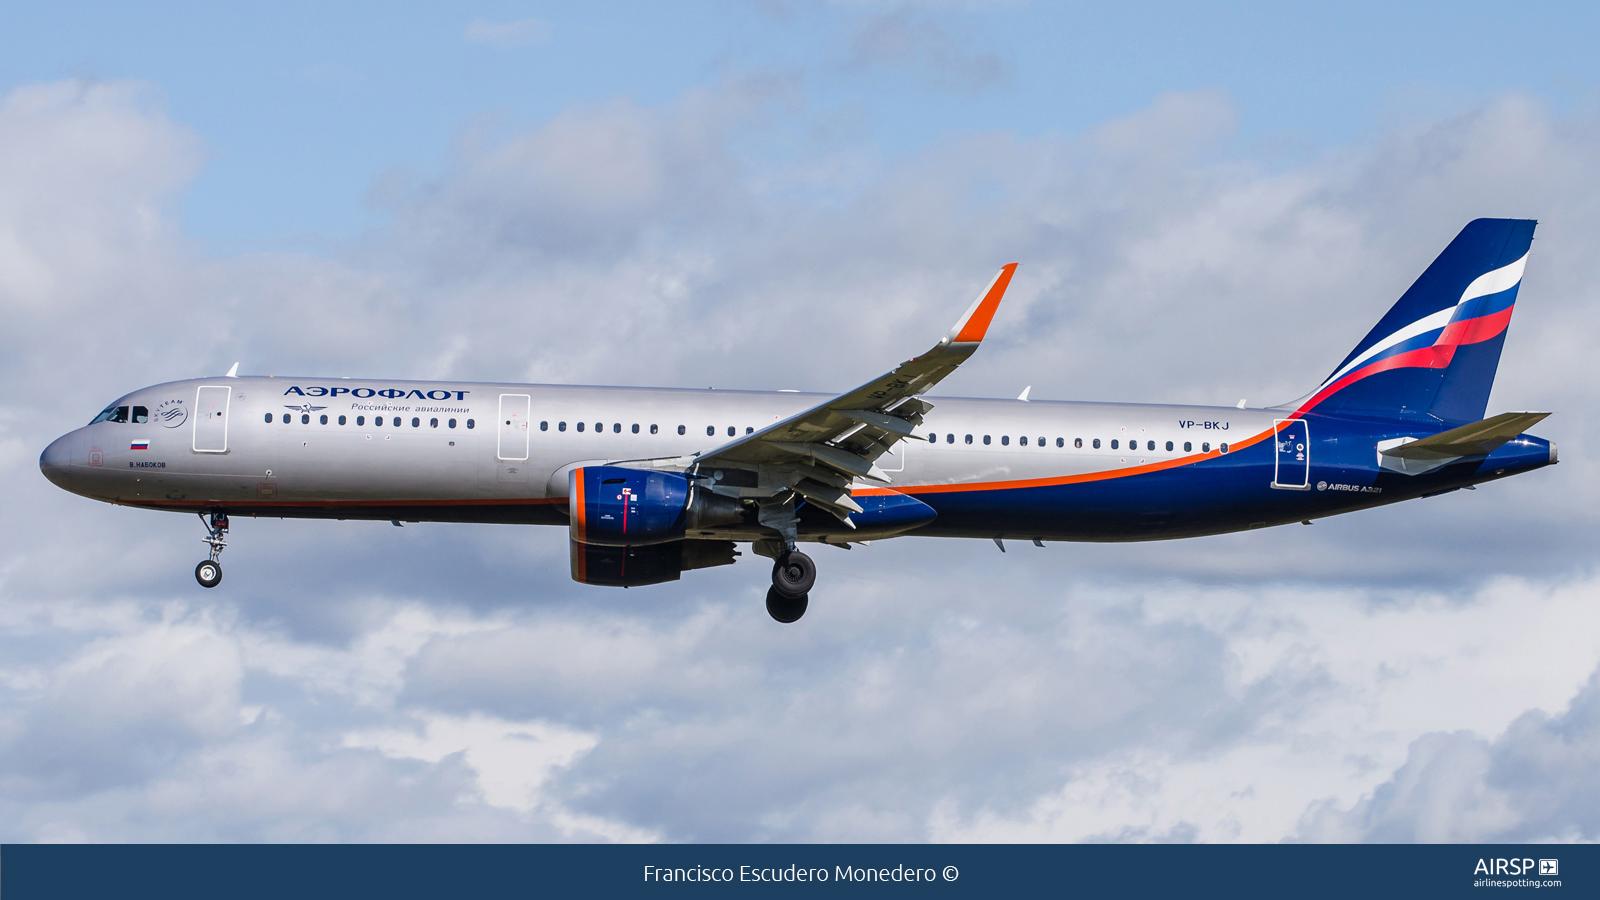 Aeroflot  Airbus A321  VP-BKJ